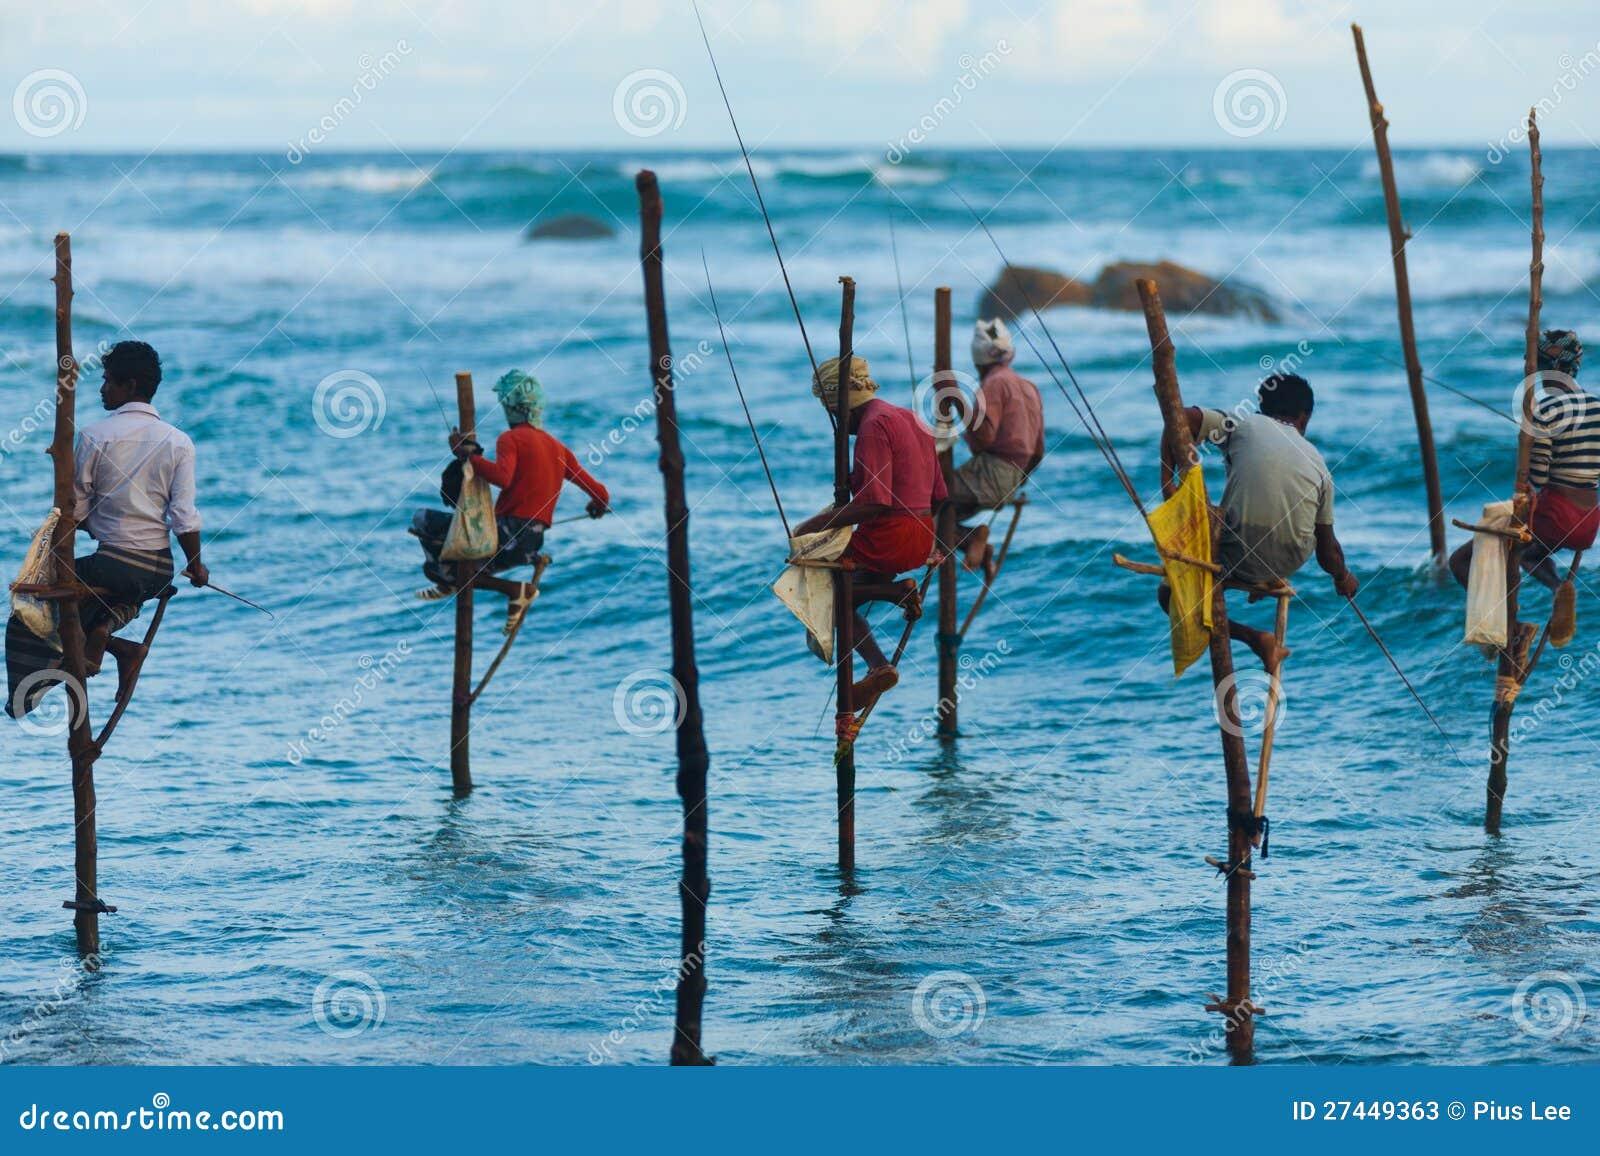 Stilt Fishermen Sri Lanka Traditional Fishing